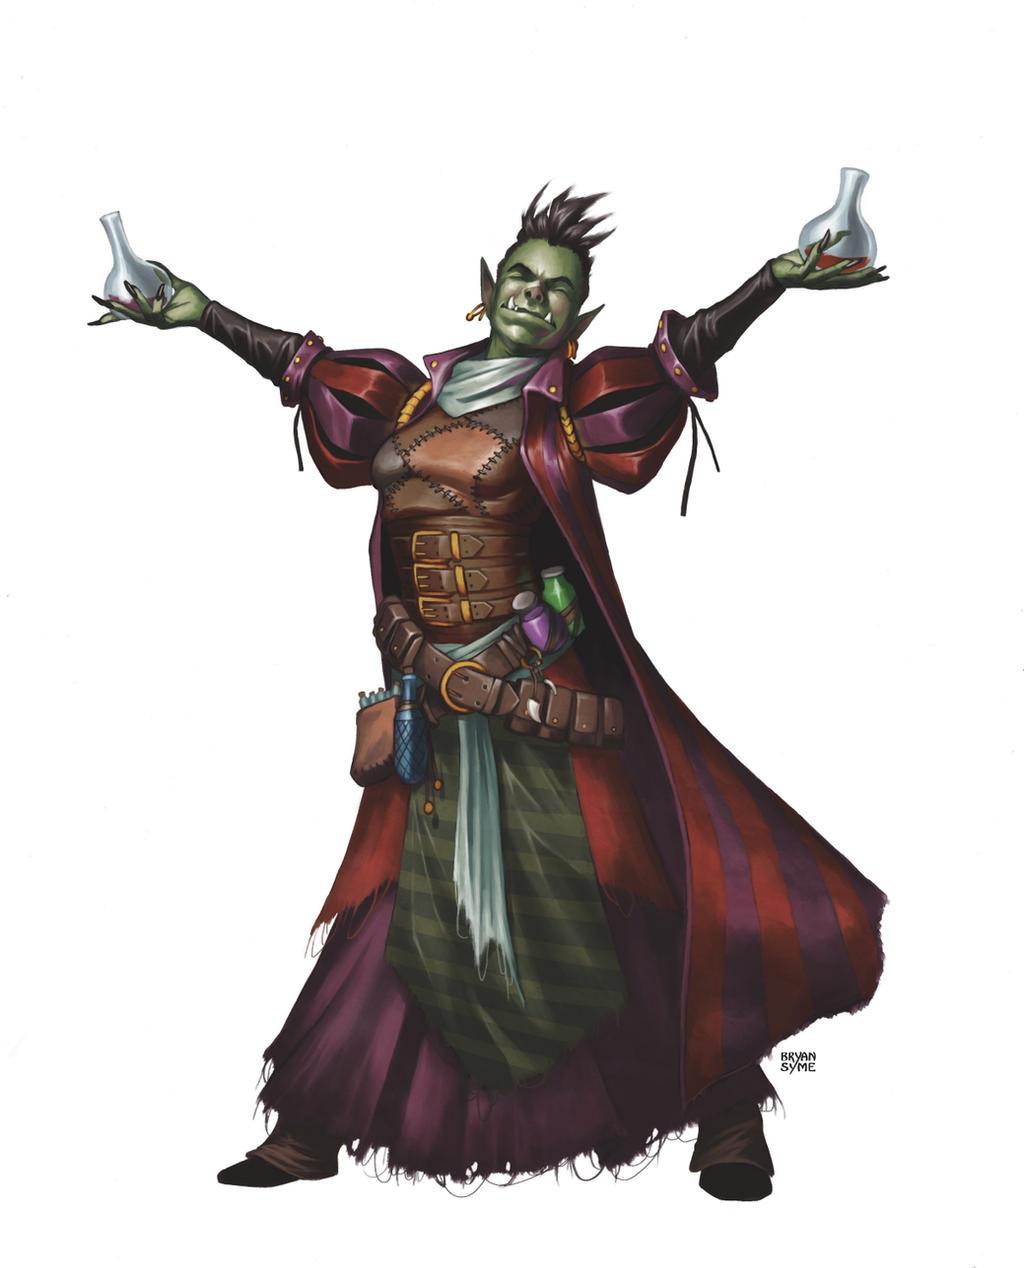 2952261a8 ... Female Alchemist Art: Drunk, Alchemist By BryanSyme On DeviantArt